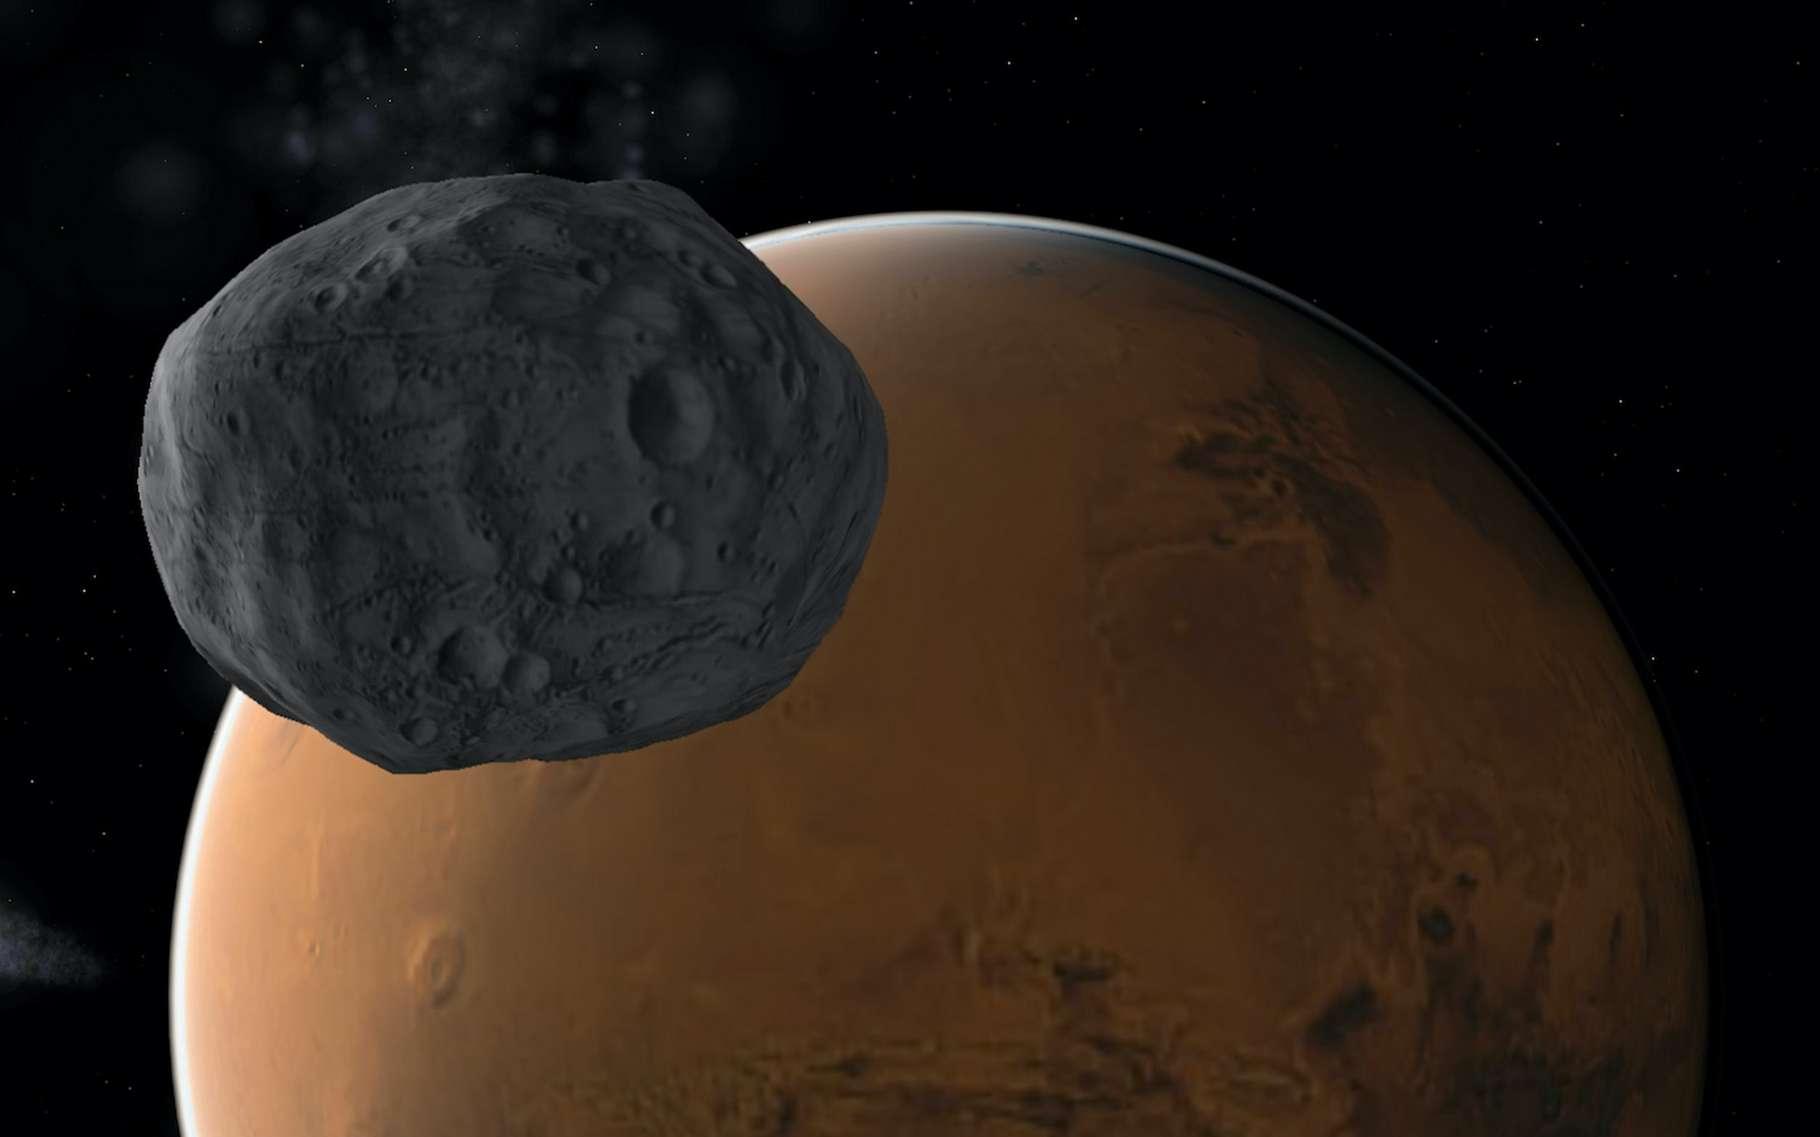 Mars et Phobos. © NJ, Adobe Stock